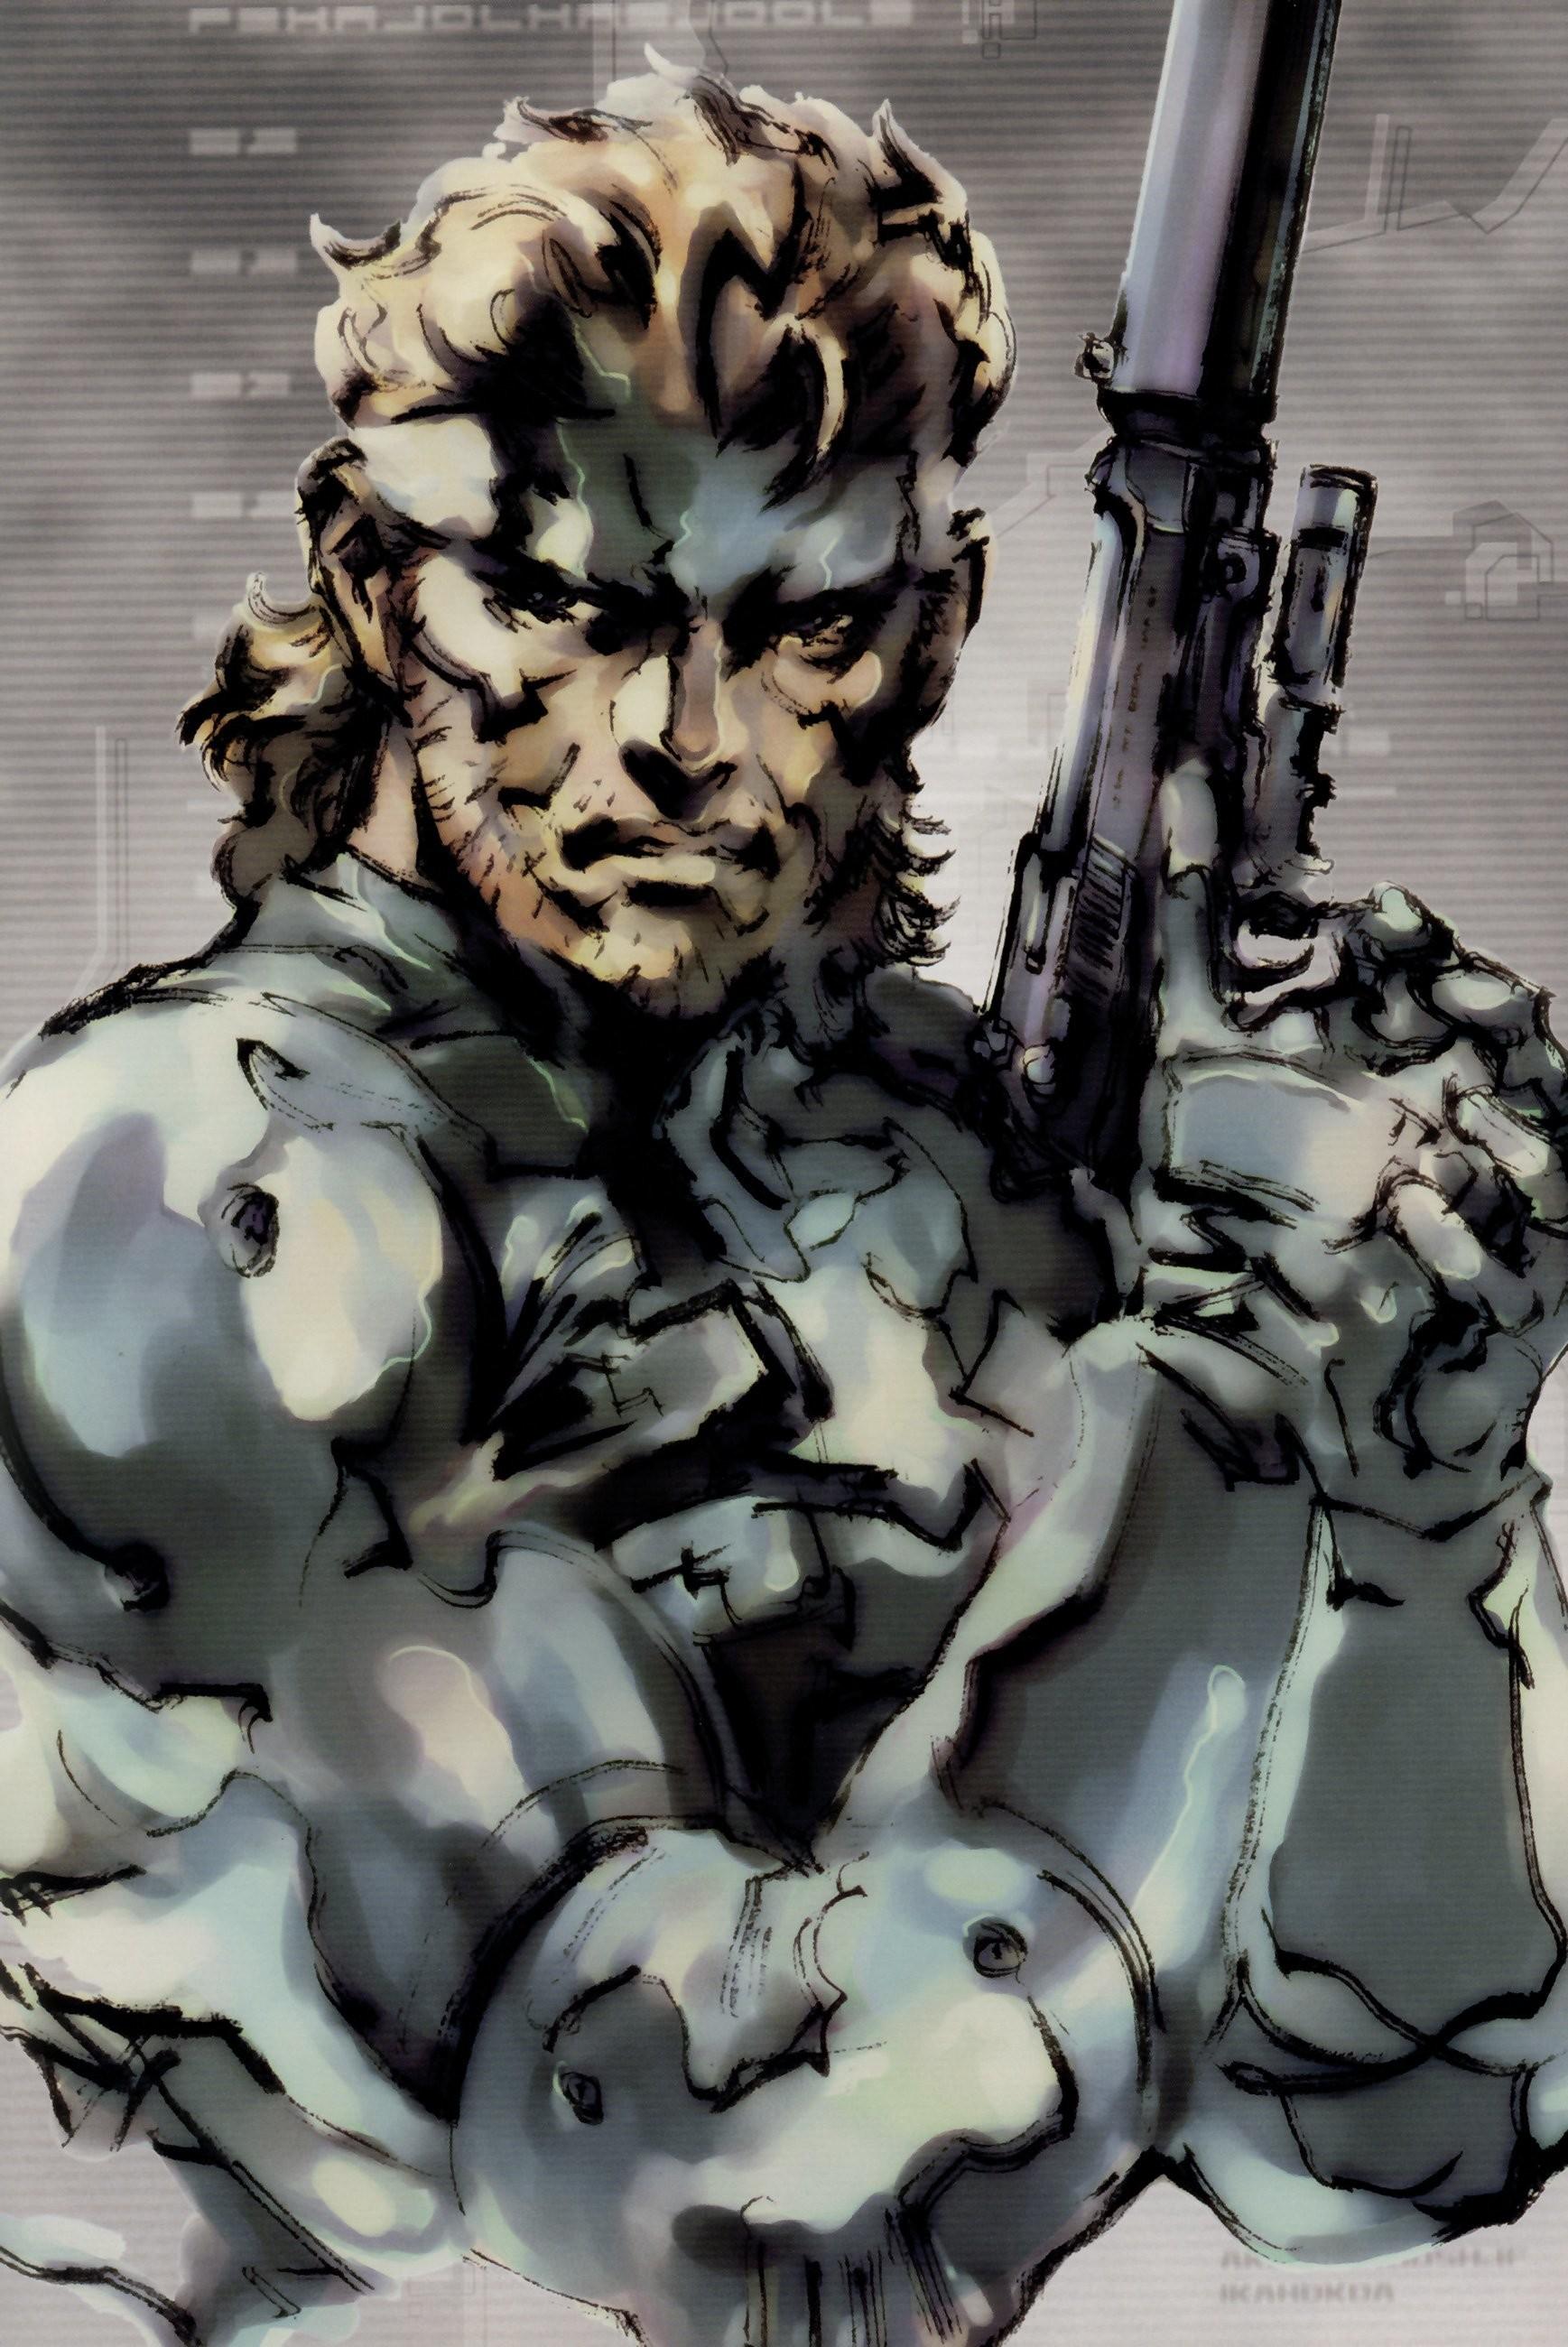 Metal Gear Solid Solid Snake wallpaper     307322   WallpaperUP